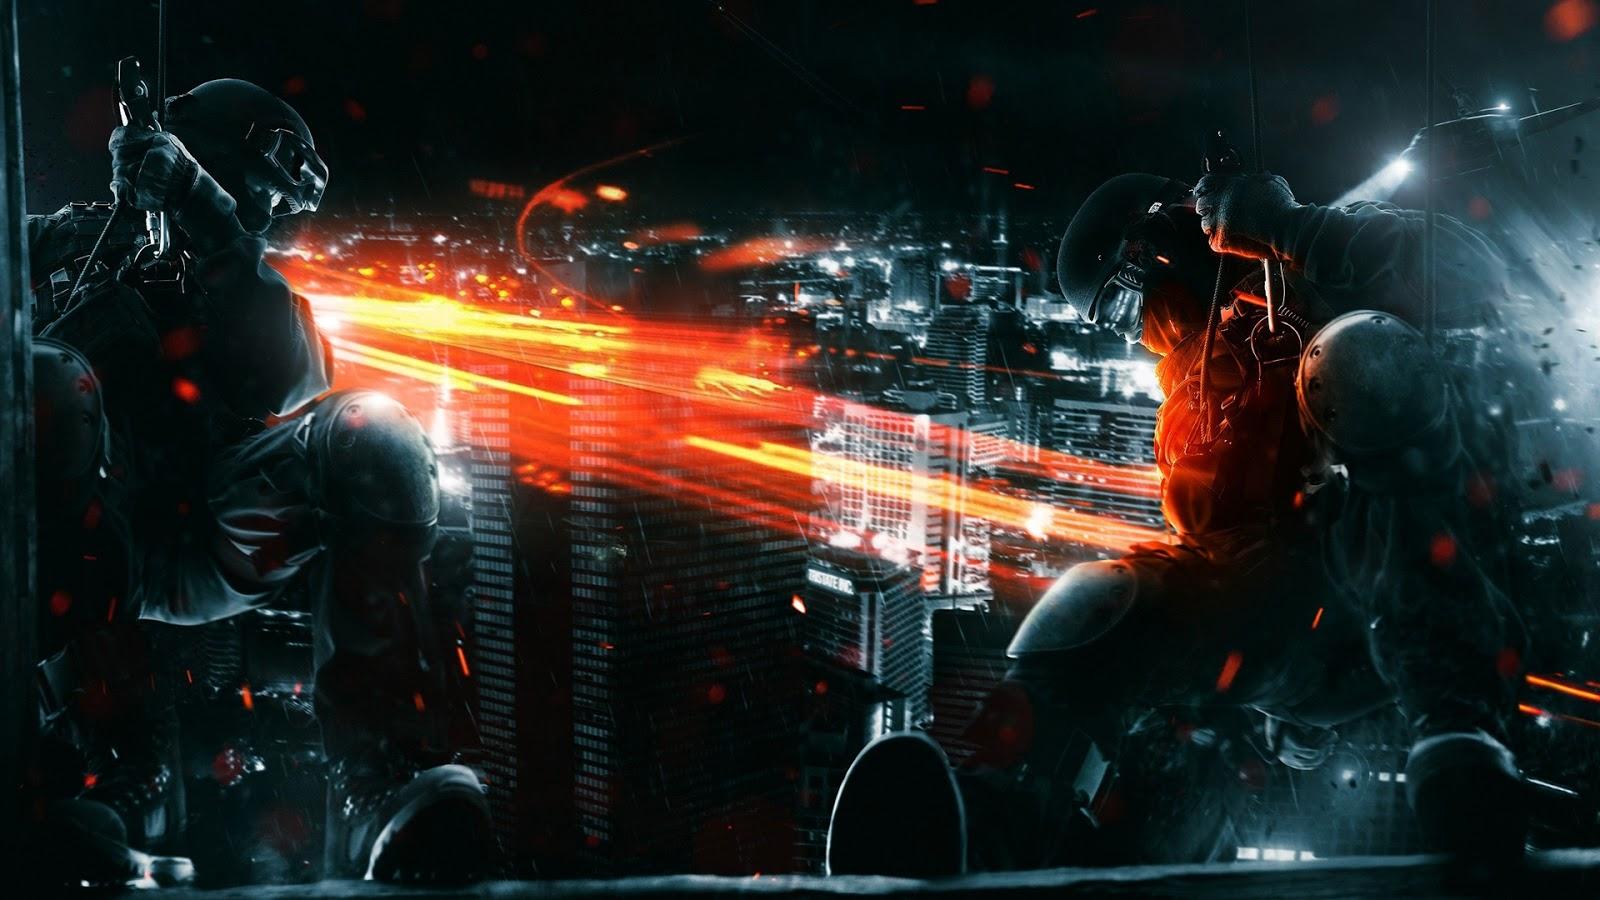 Battlefield 3 Aftermath wallpapers or desktop backgrounds